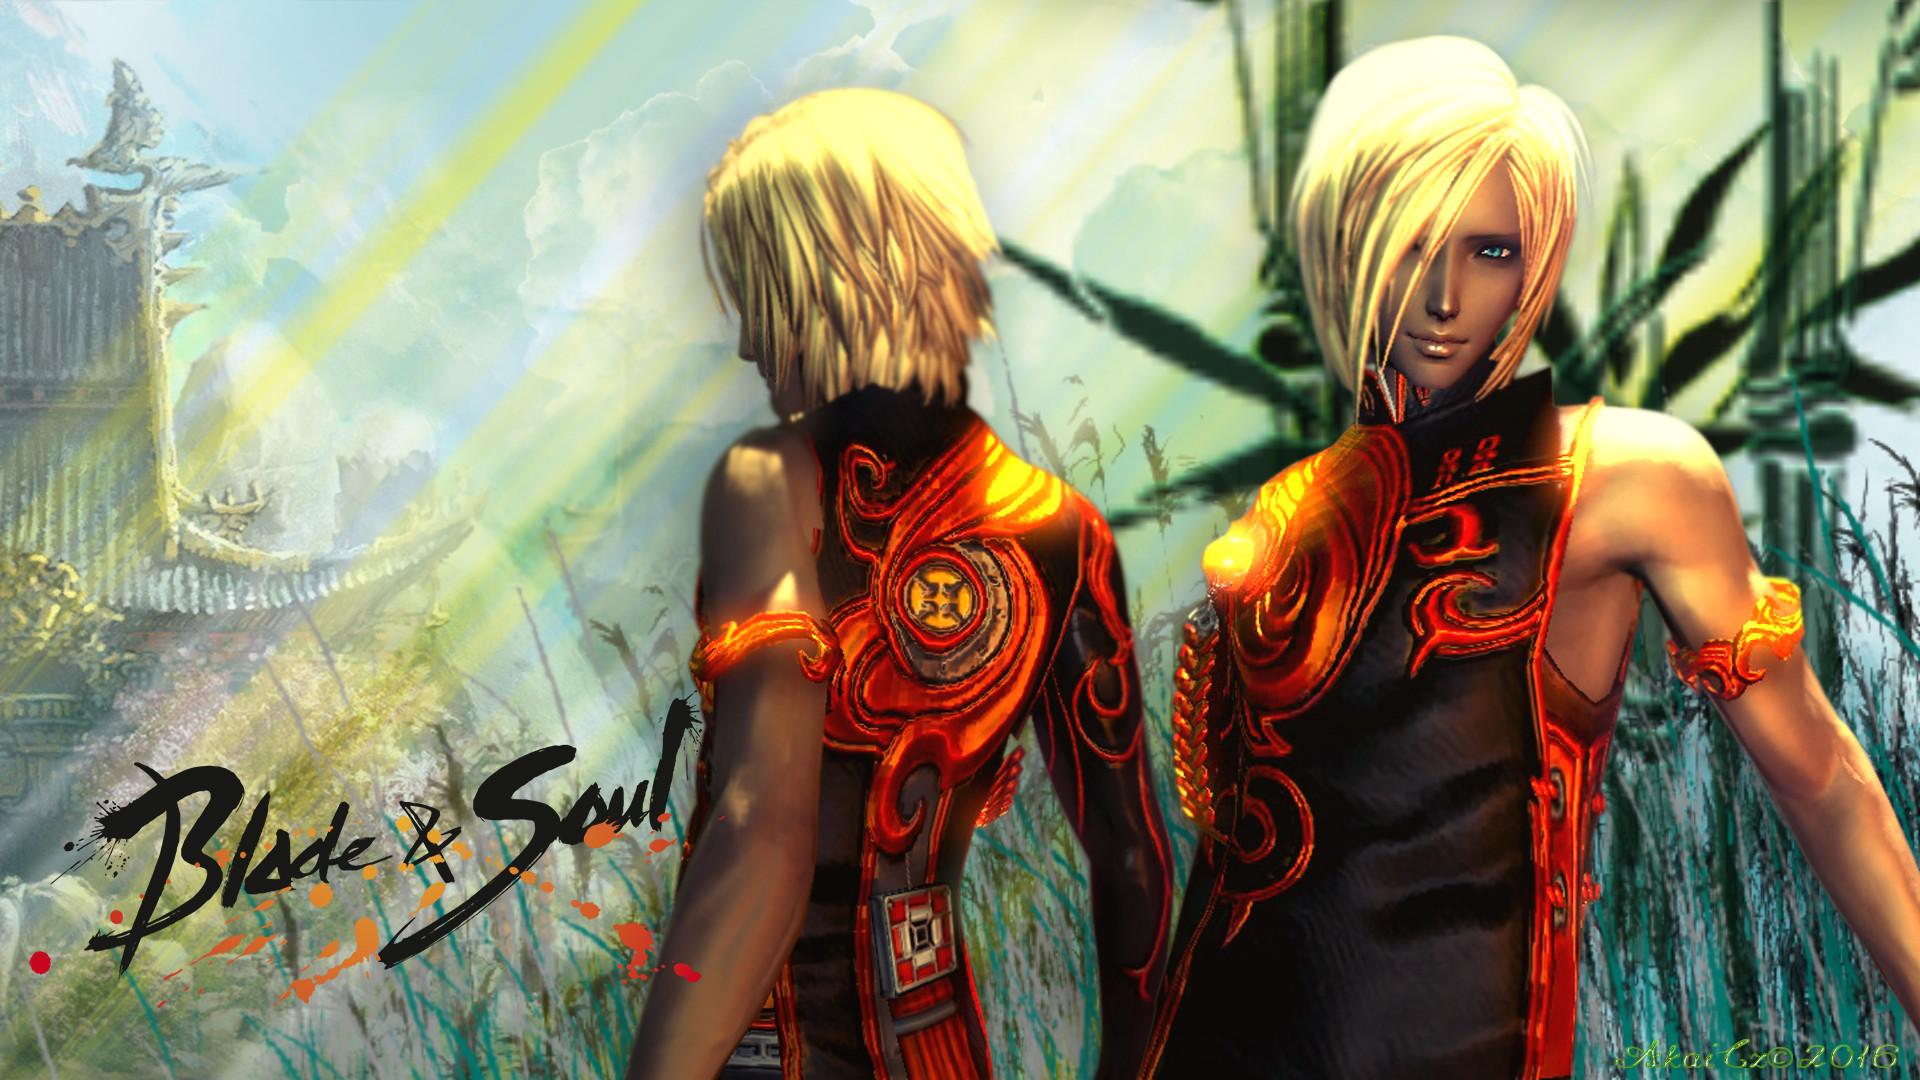 blade and soul_akaicz_2016_001